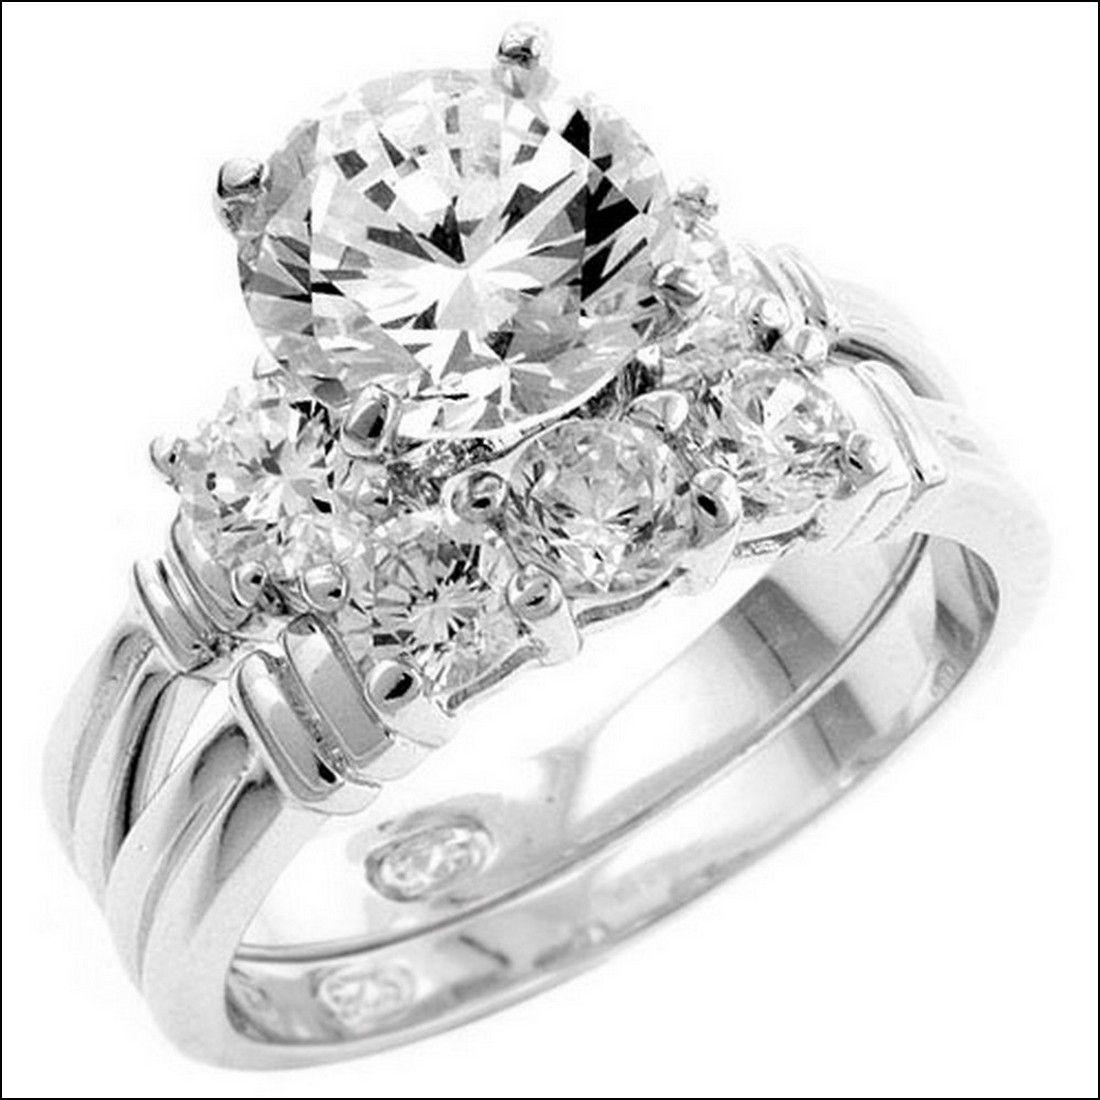 Most Amazing Wedding Rings Wedding Ideas Pinterest Ring